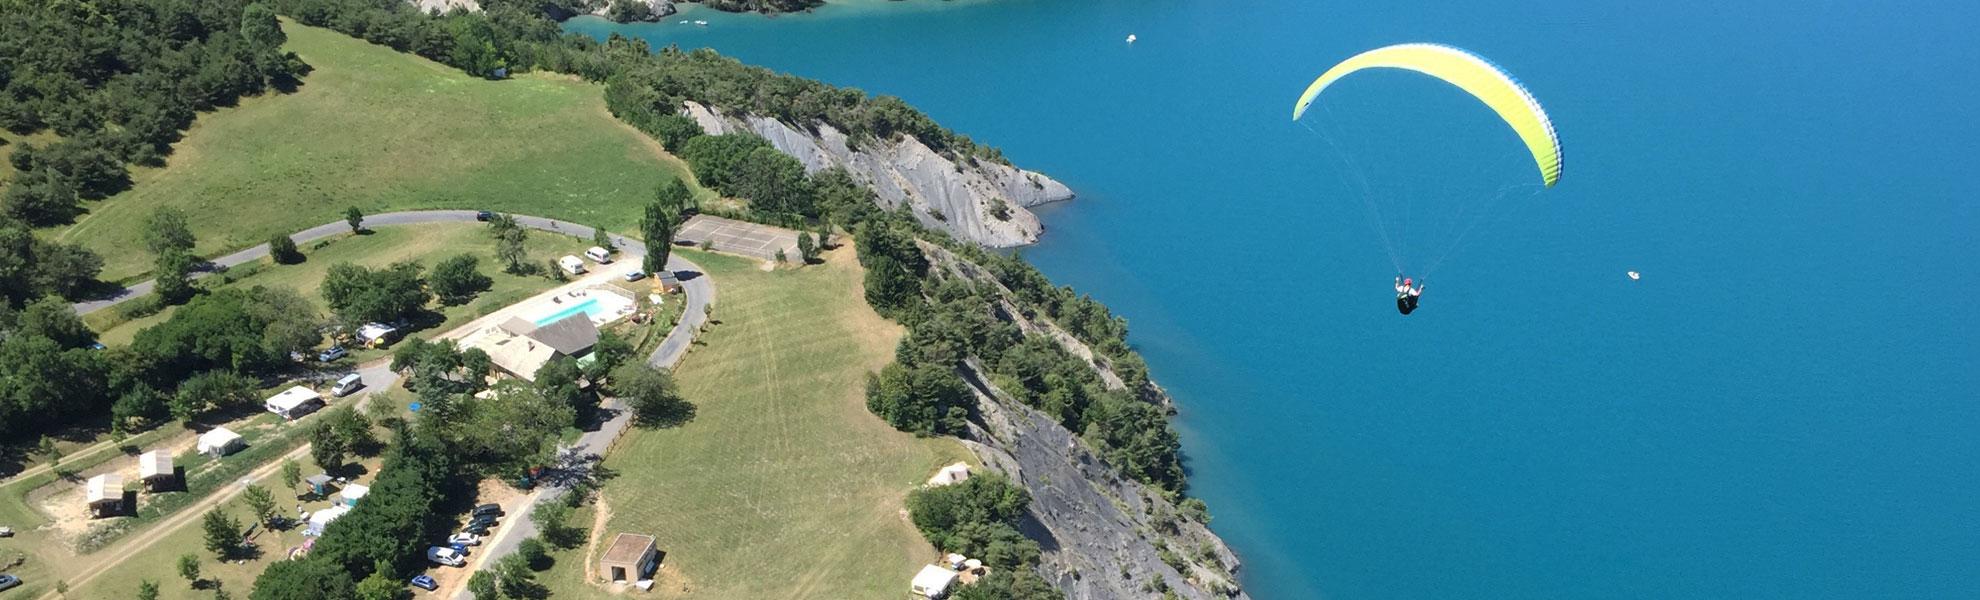 Frankrijk-brevet-2-paragliding